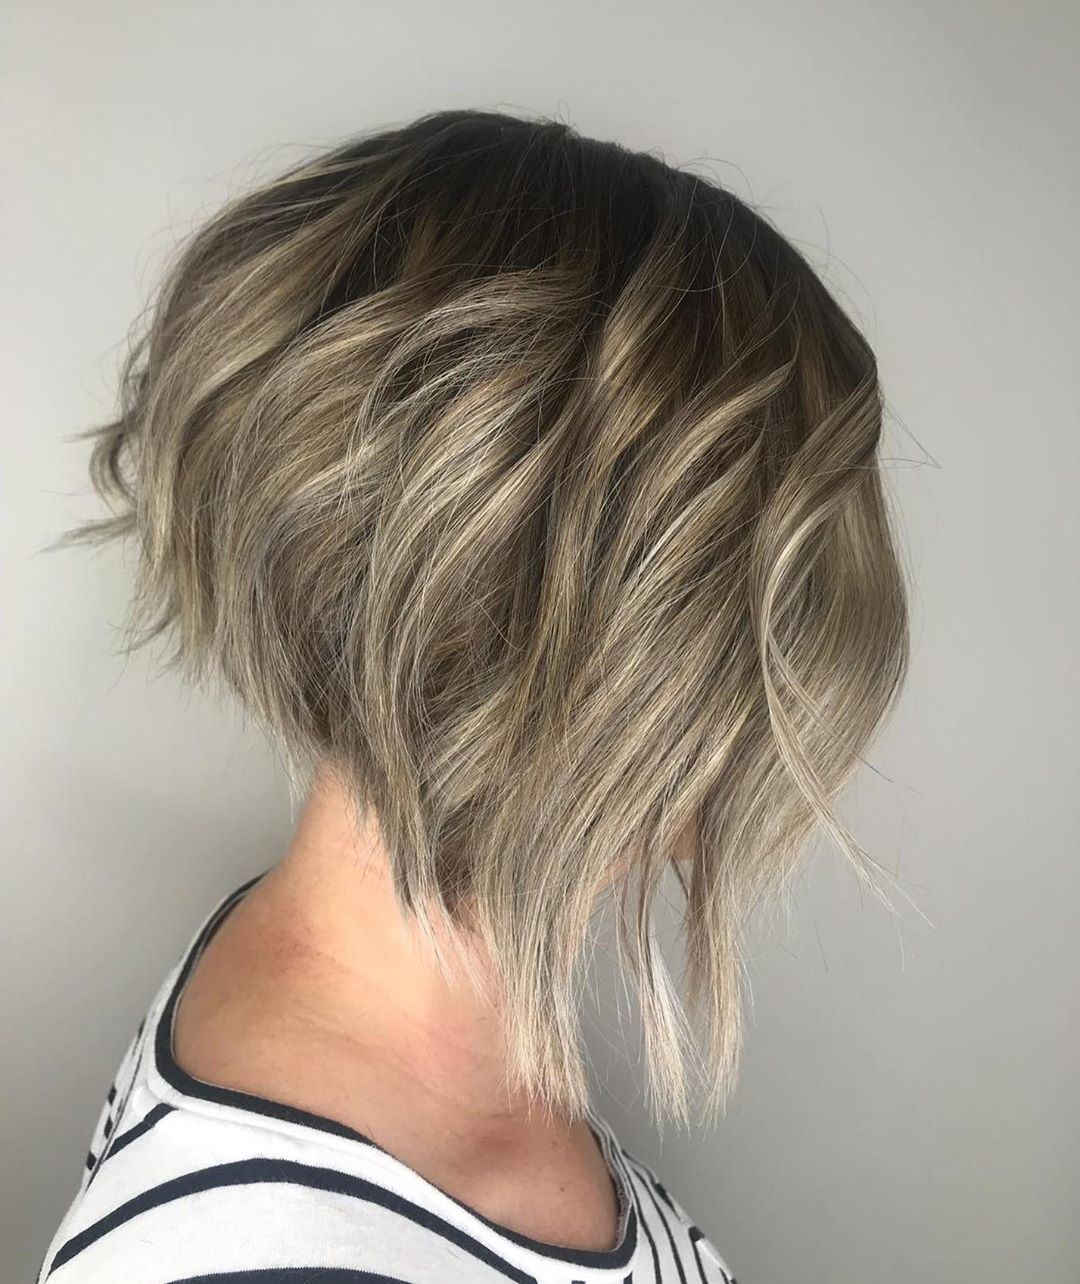 Femme avec un bob ondulé blond foncé